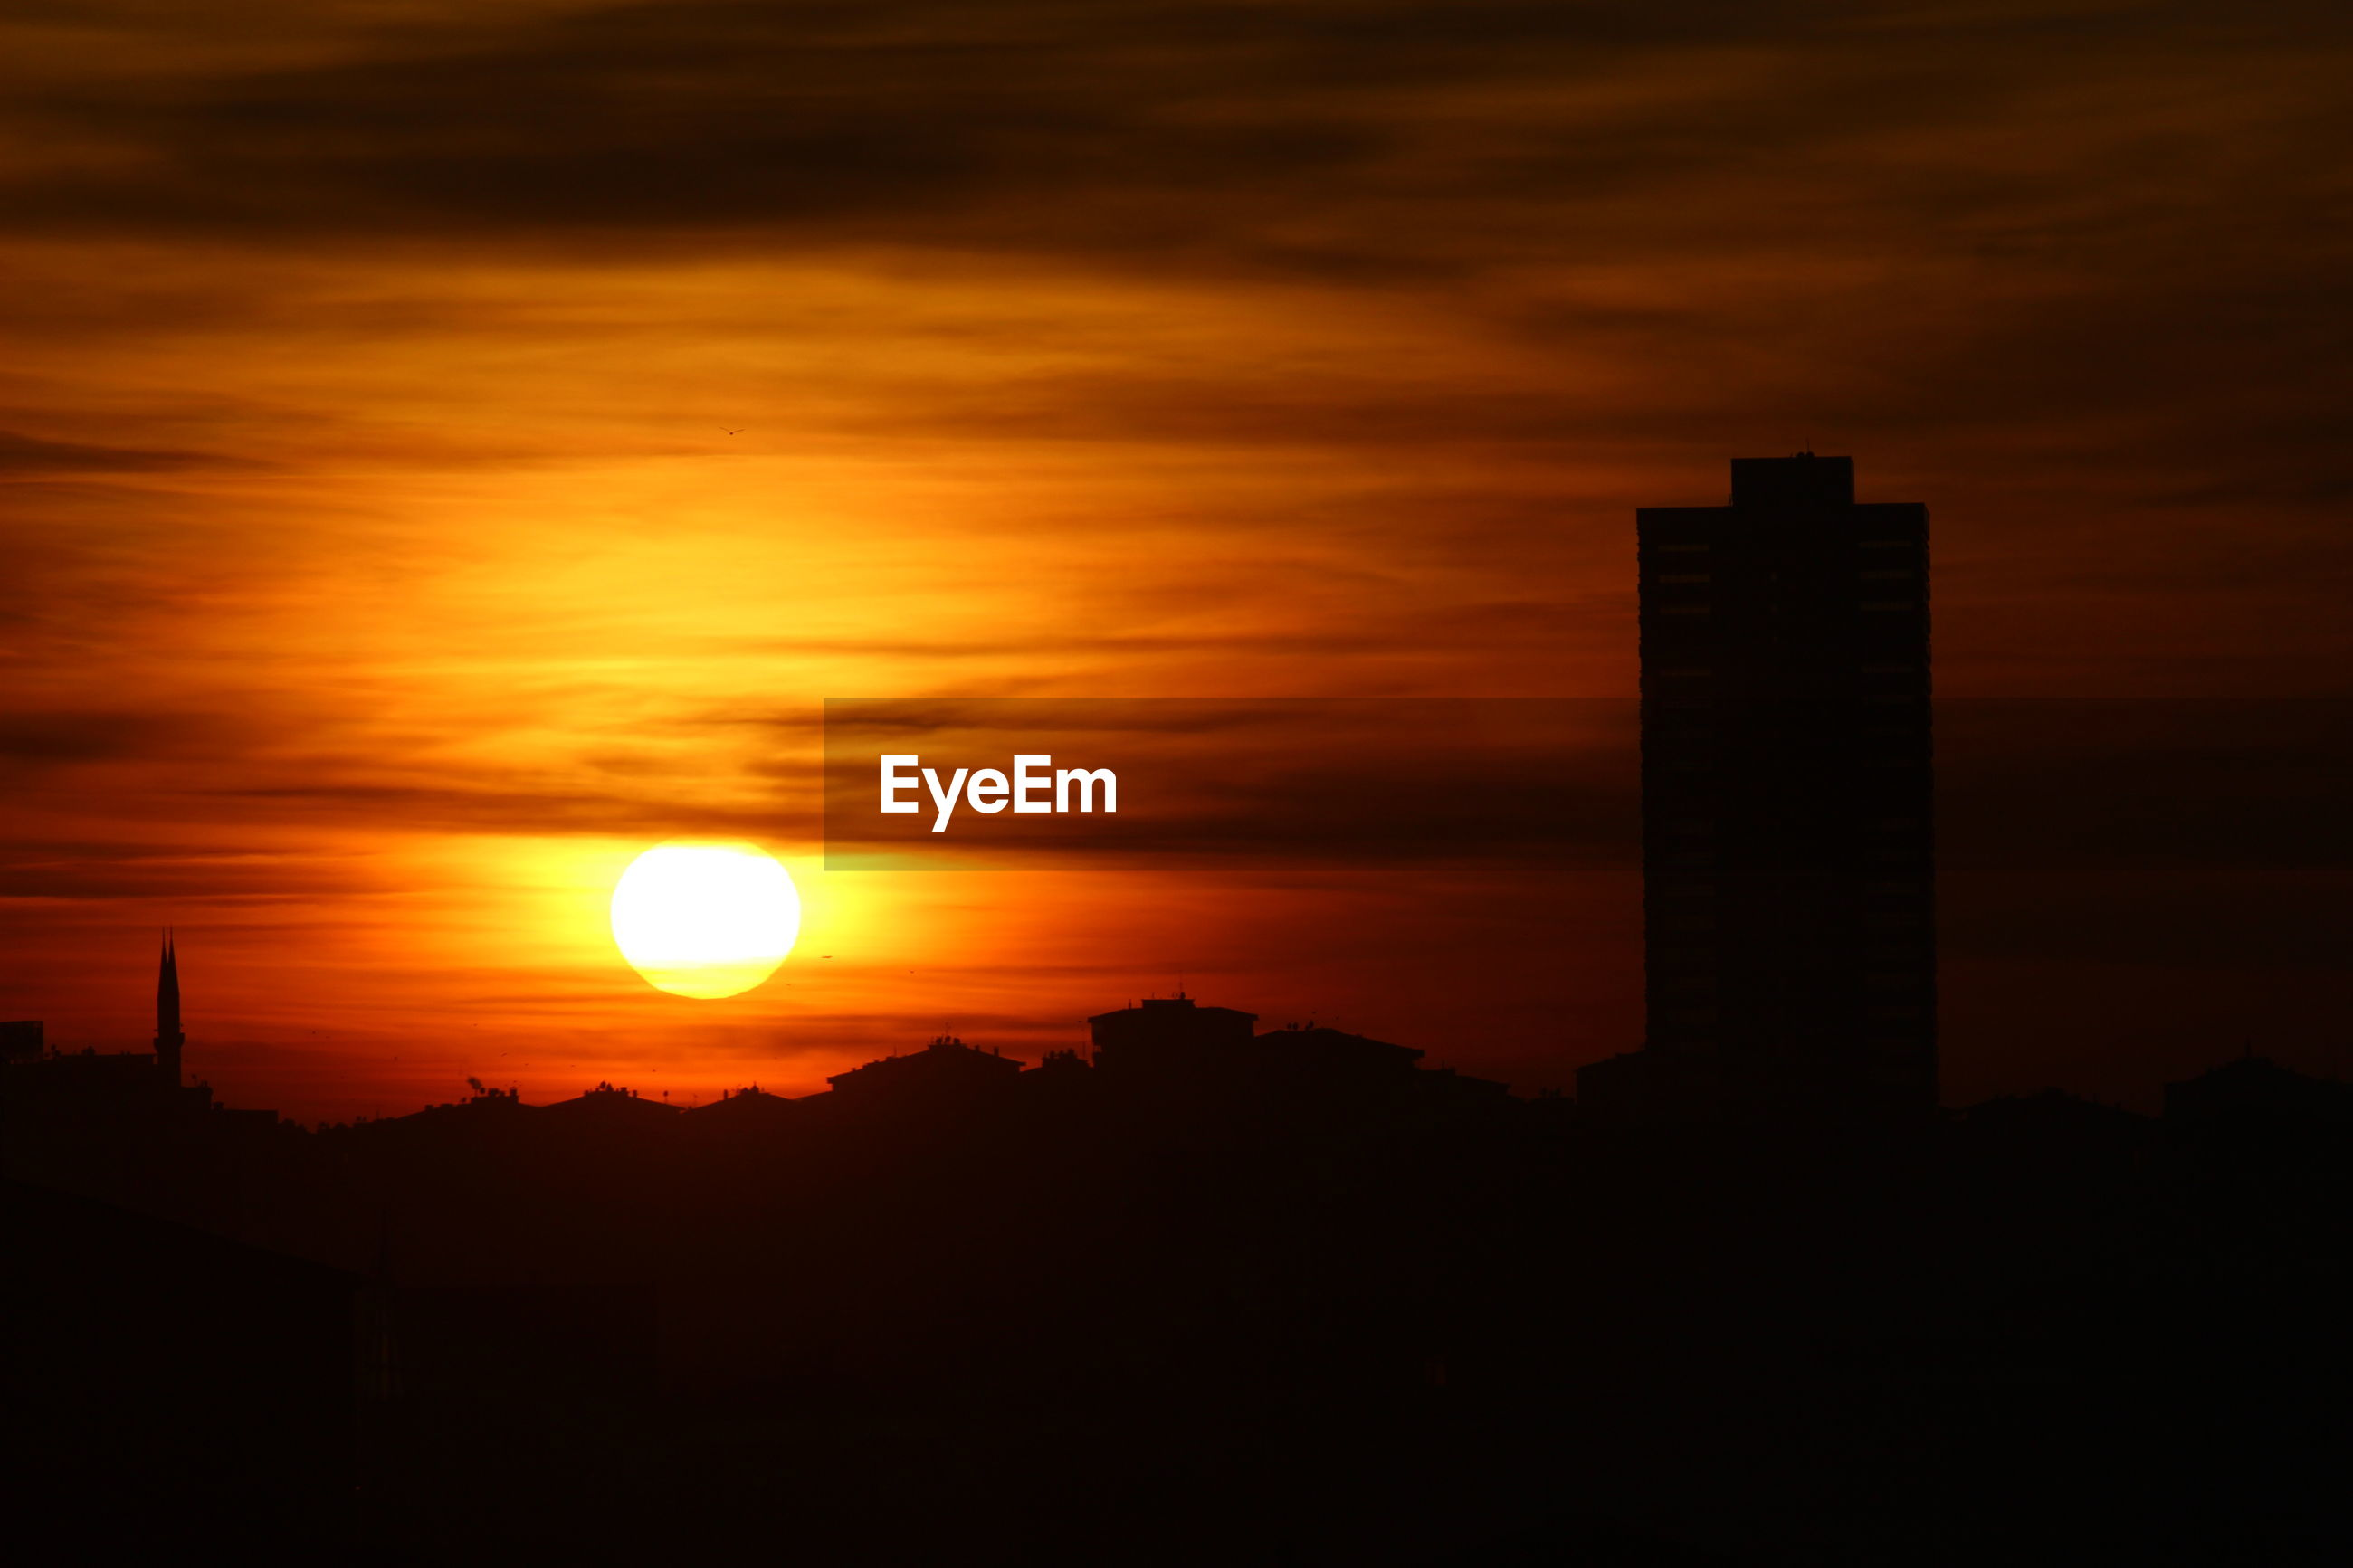 sunset, silhouette, orange color, sun, sky, building exterior, architecture, built structure, scenics, beauty in nature, cloud - sky, idyllic, dark, nature, dramatic sky, tranquil scene, tranquility, cloud, sunlight, moody sky